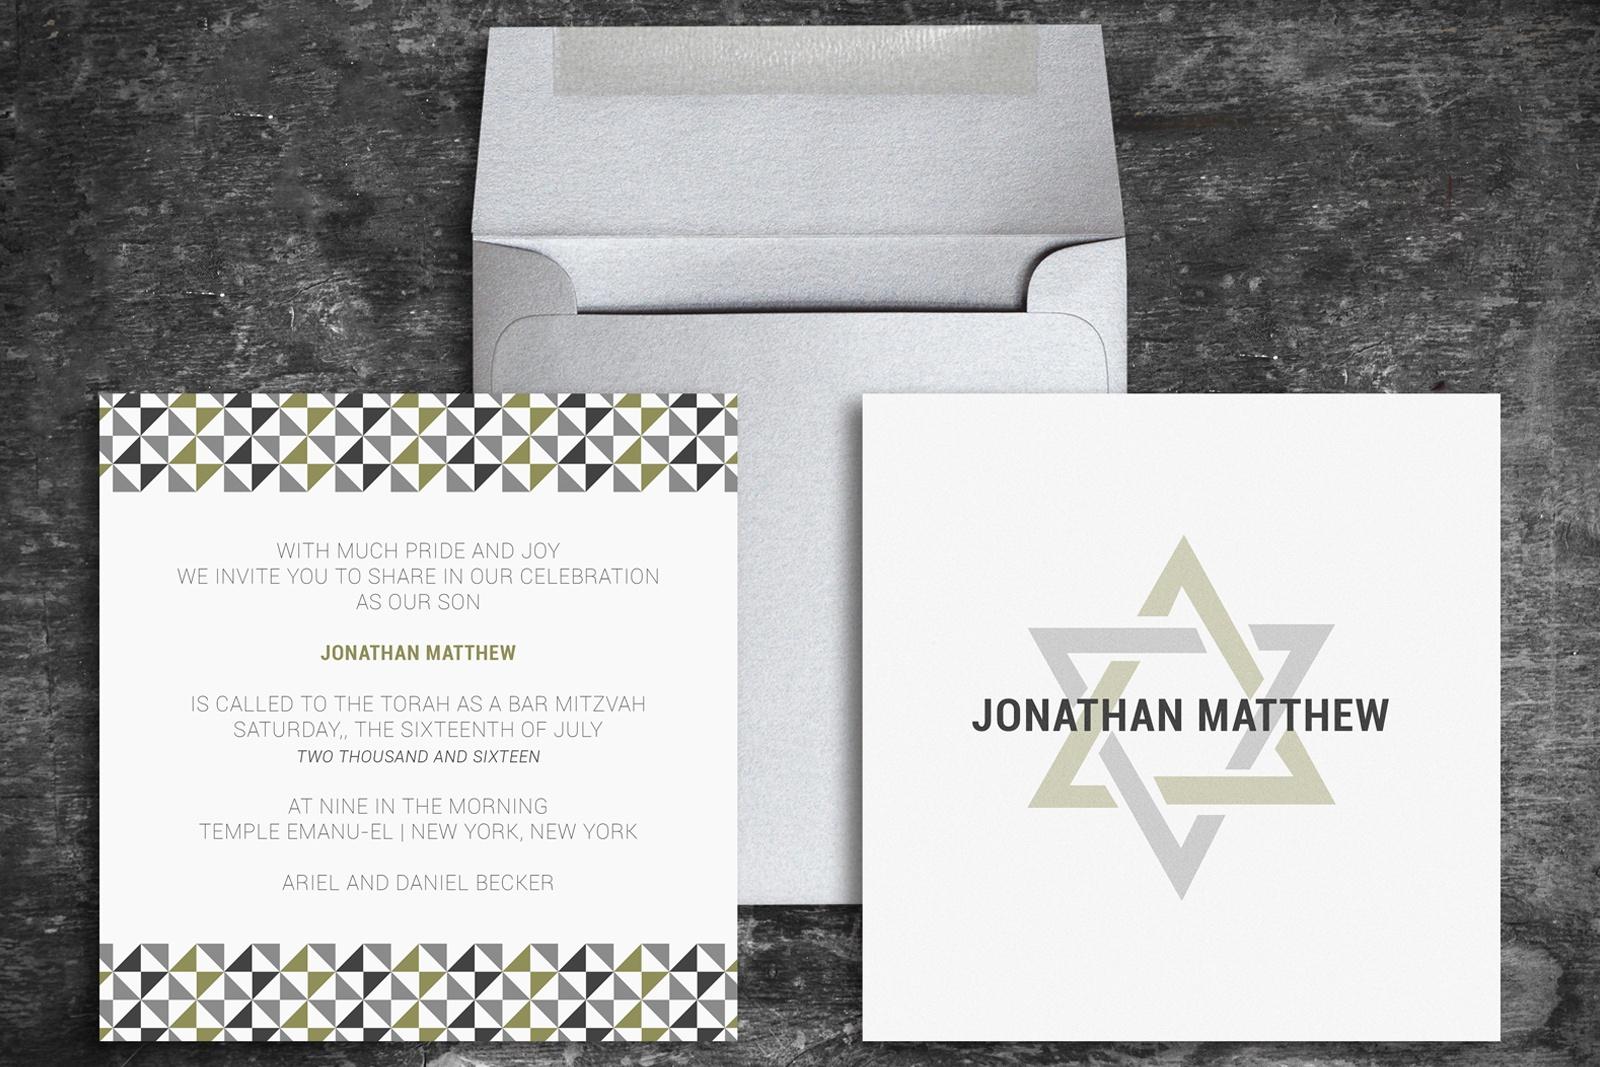 Best Wedding Invitations Toronto